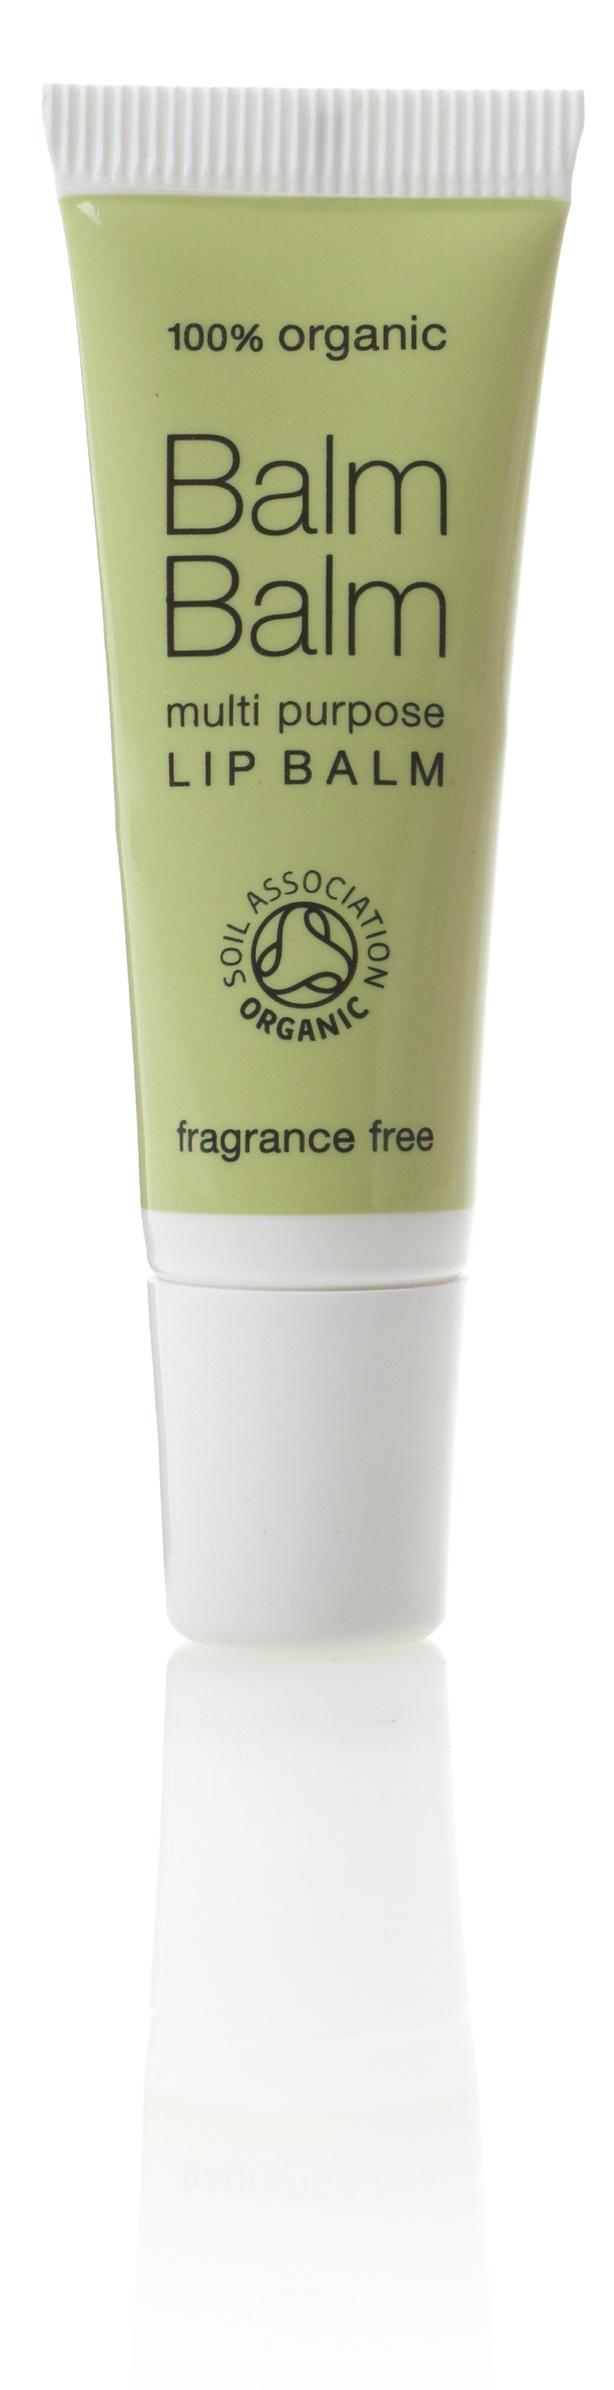 Balm Balm - baume lèvres en tube - Sans parfum